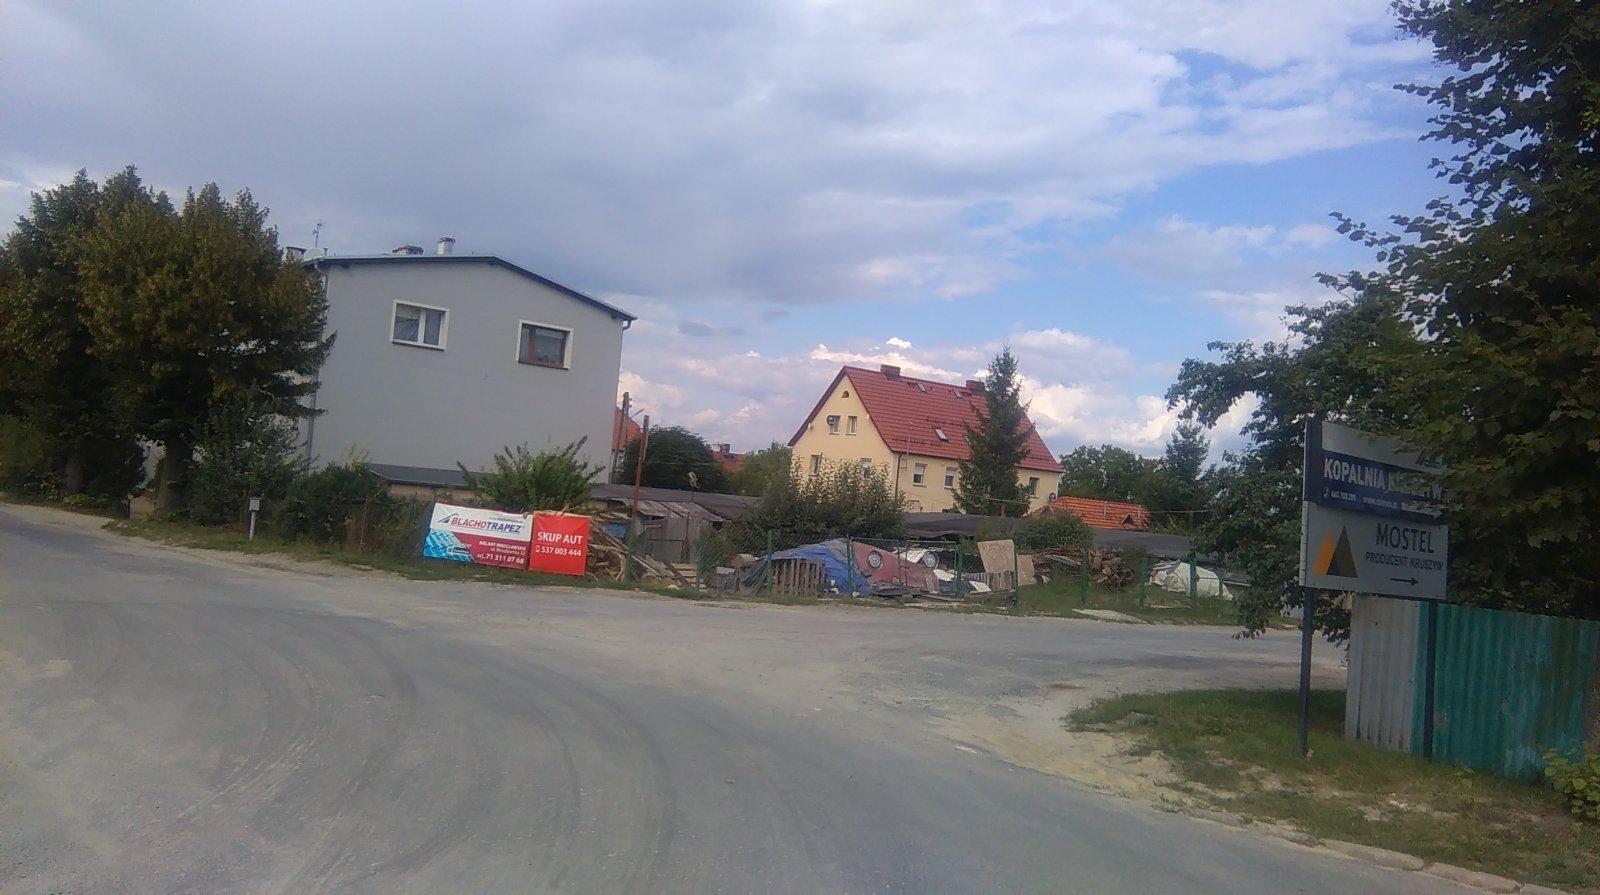 IMAG0224.jpg